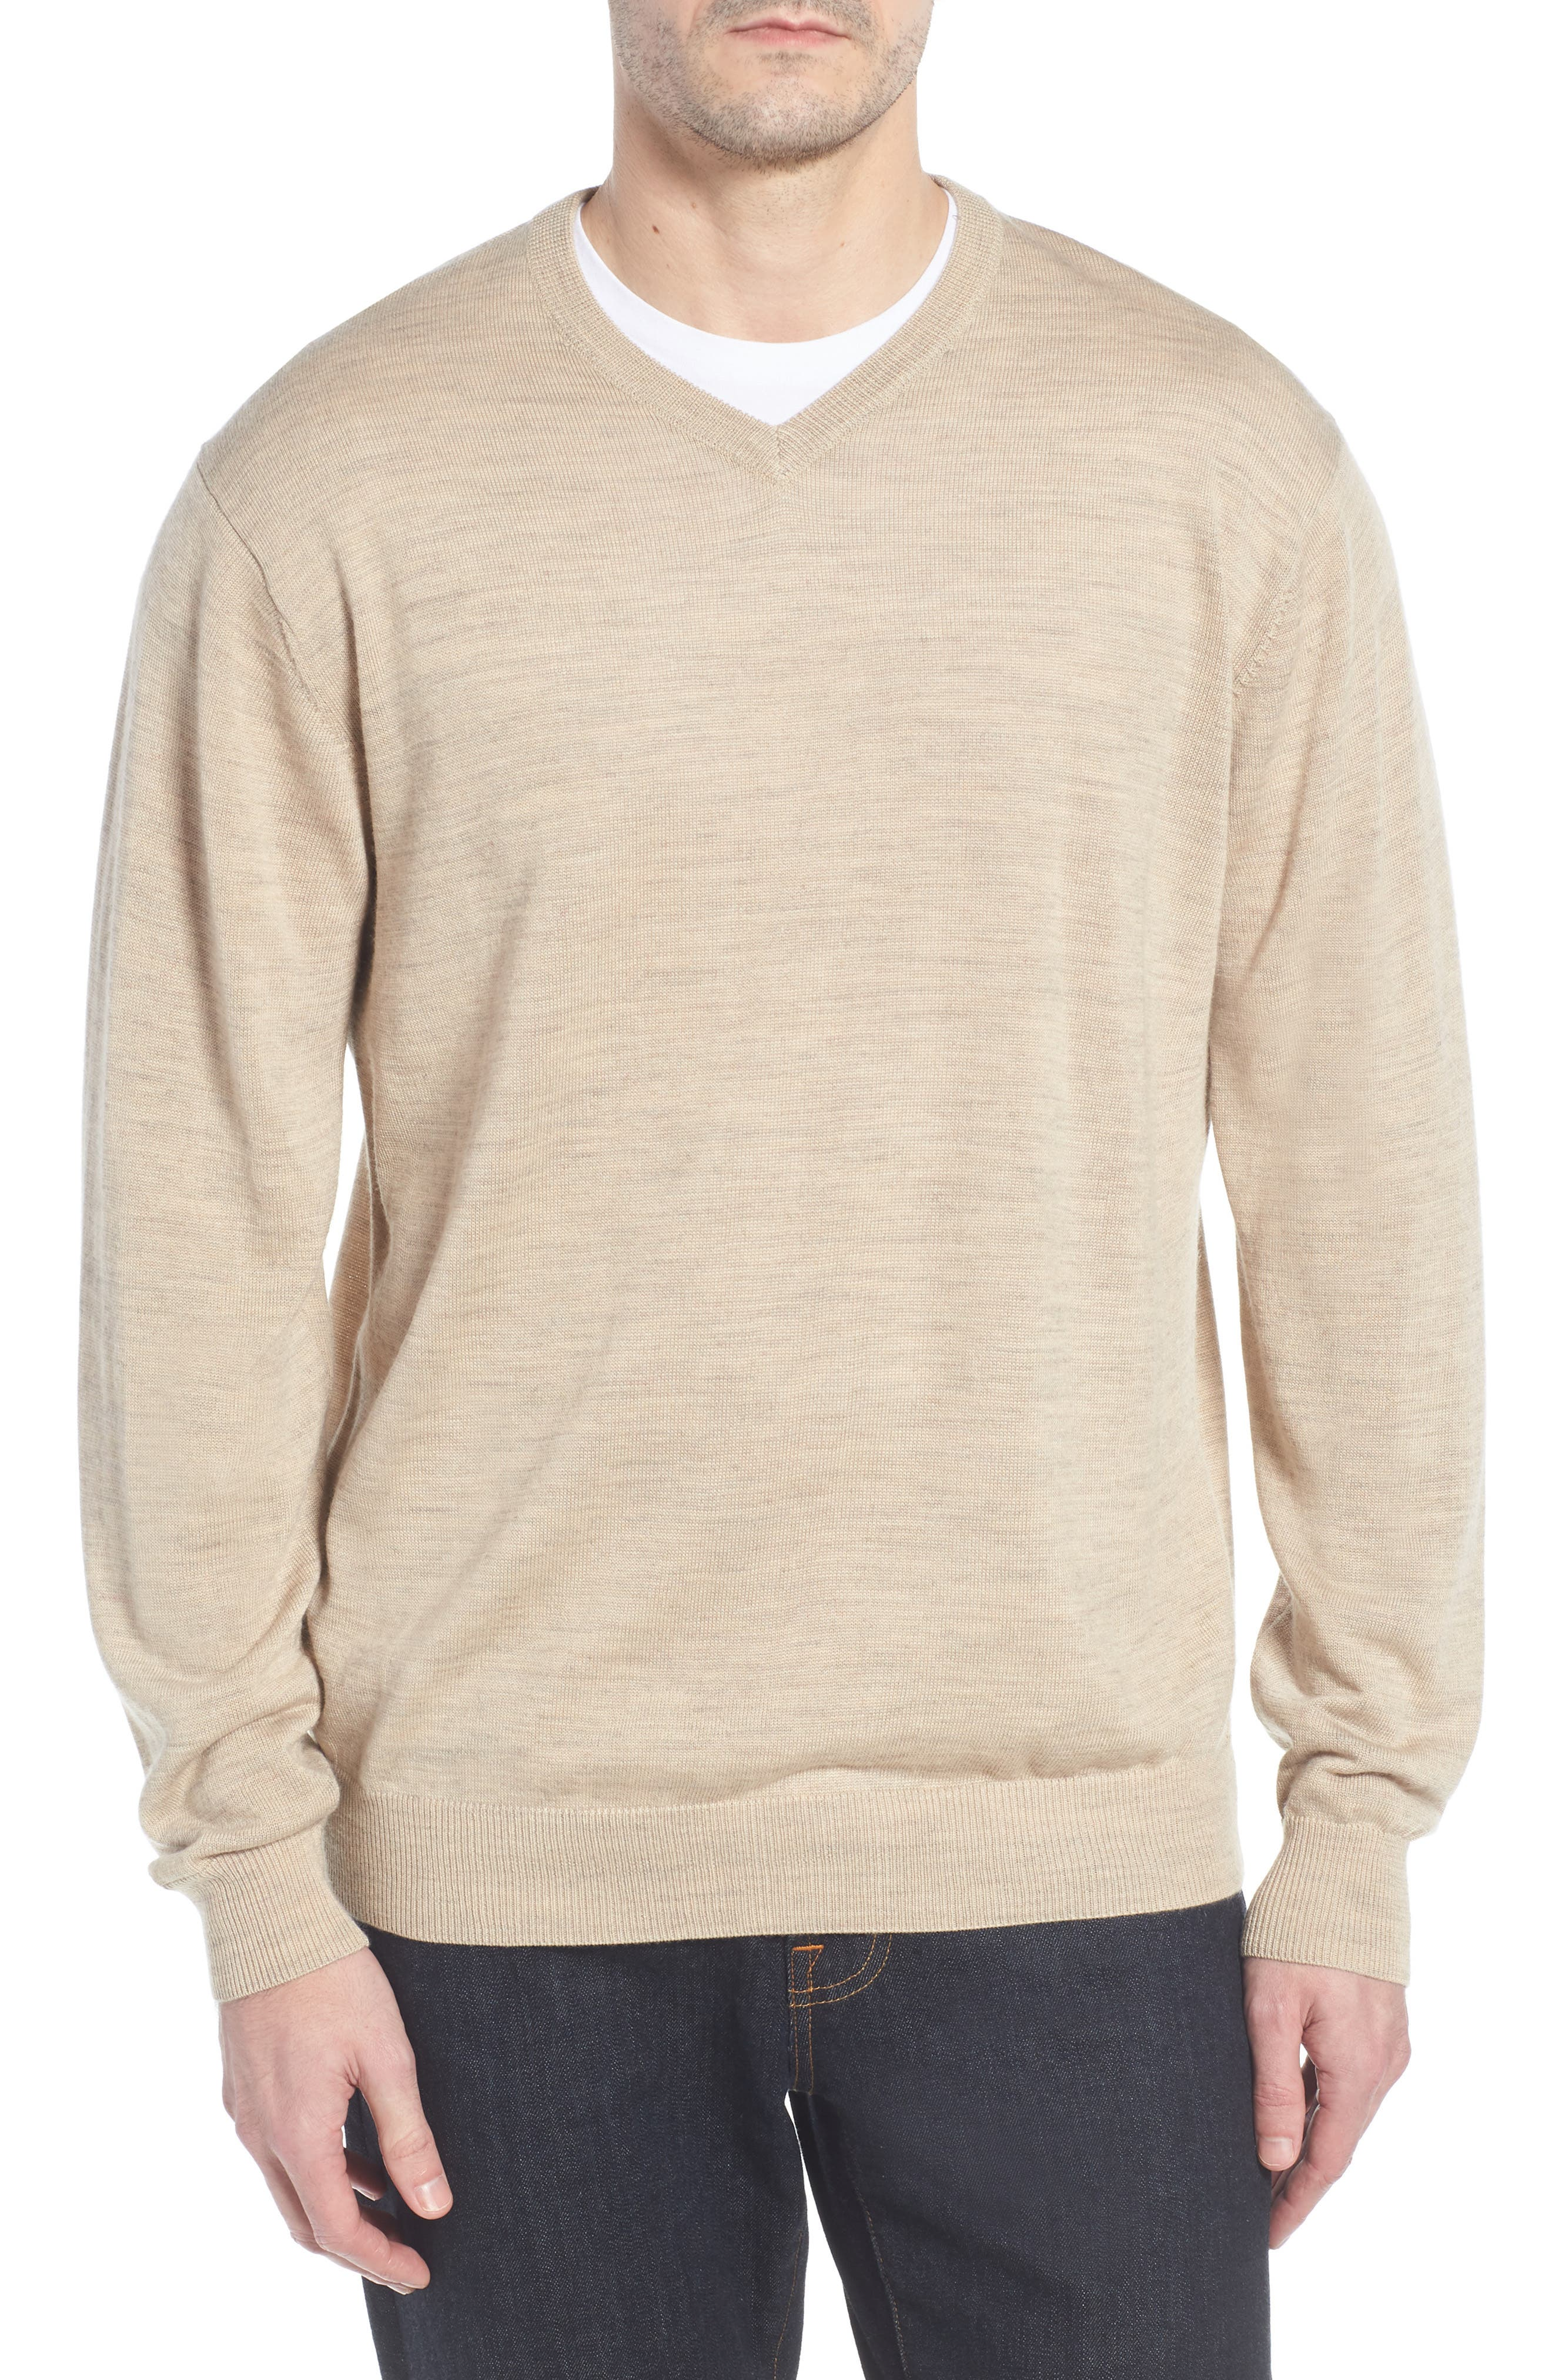 CUTTER & BUCK 'Douglas' Merino Wool Blend V-Neck Sweater, Main, color, SAND HEATHER